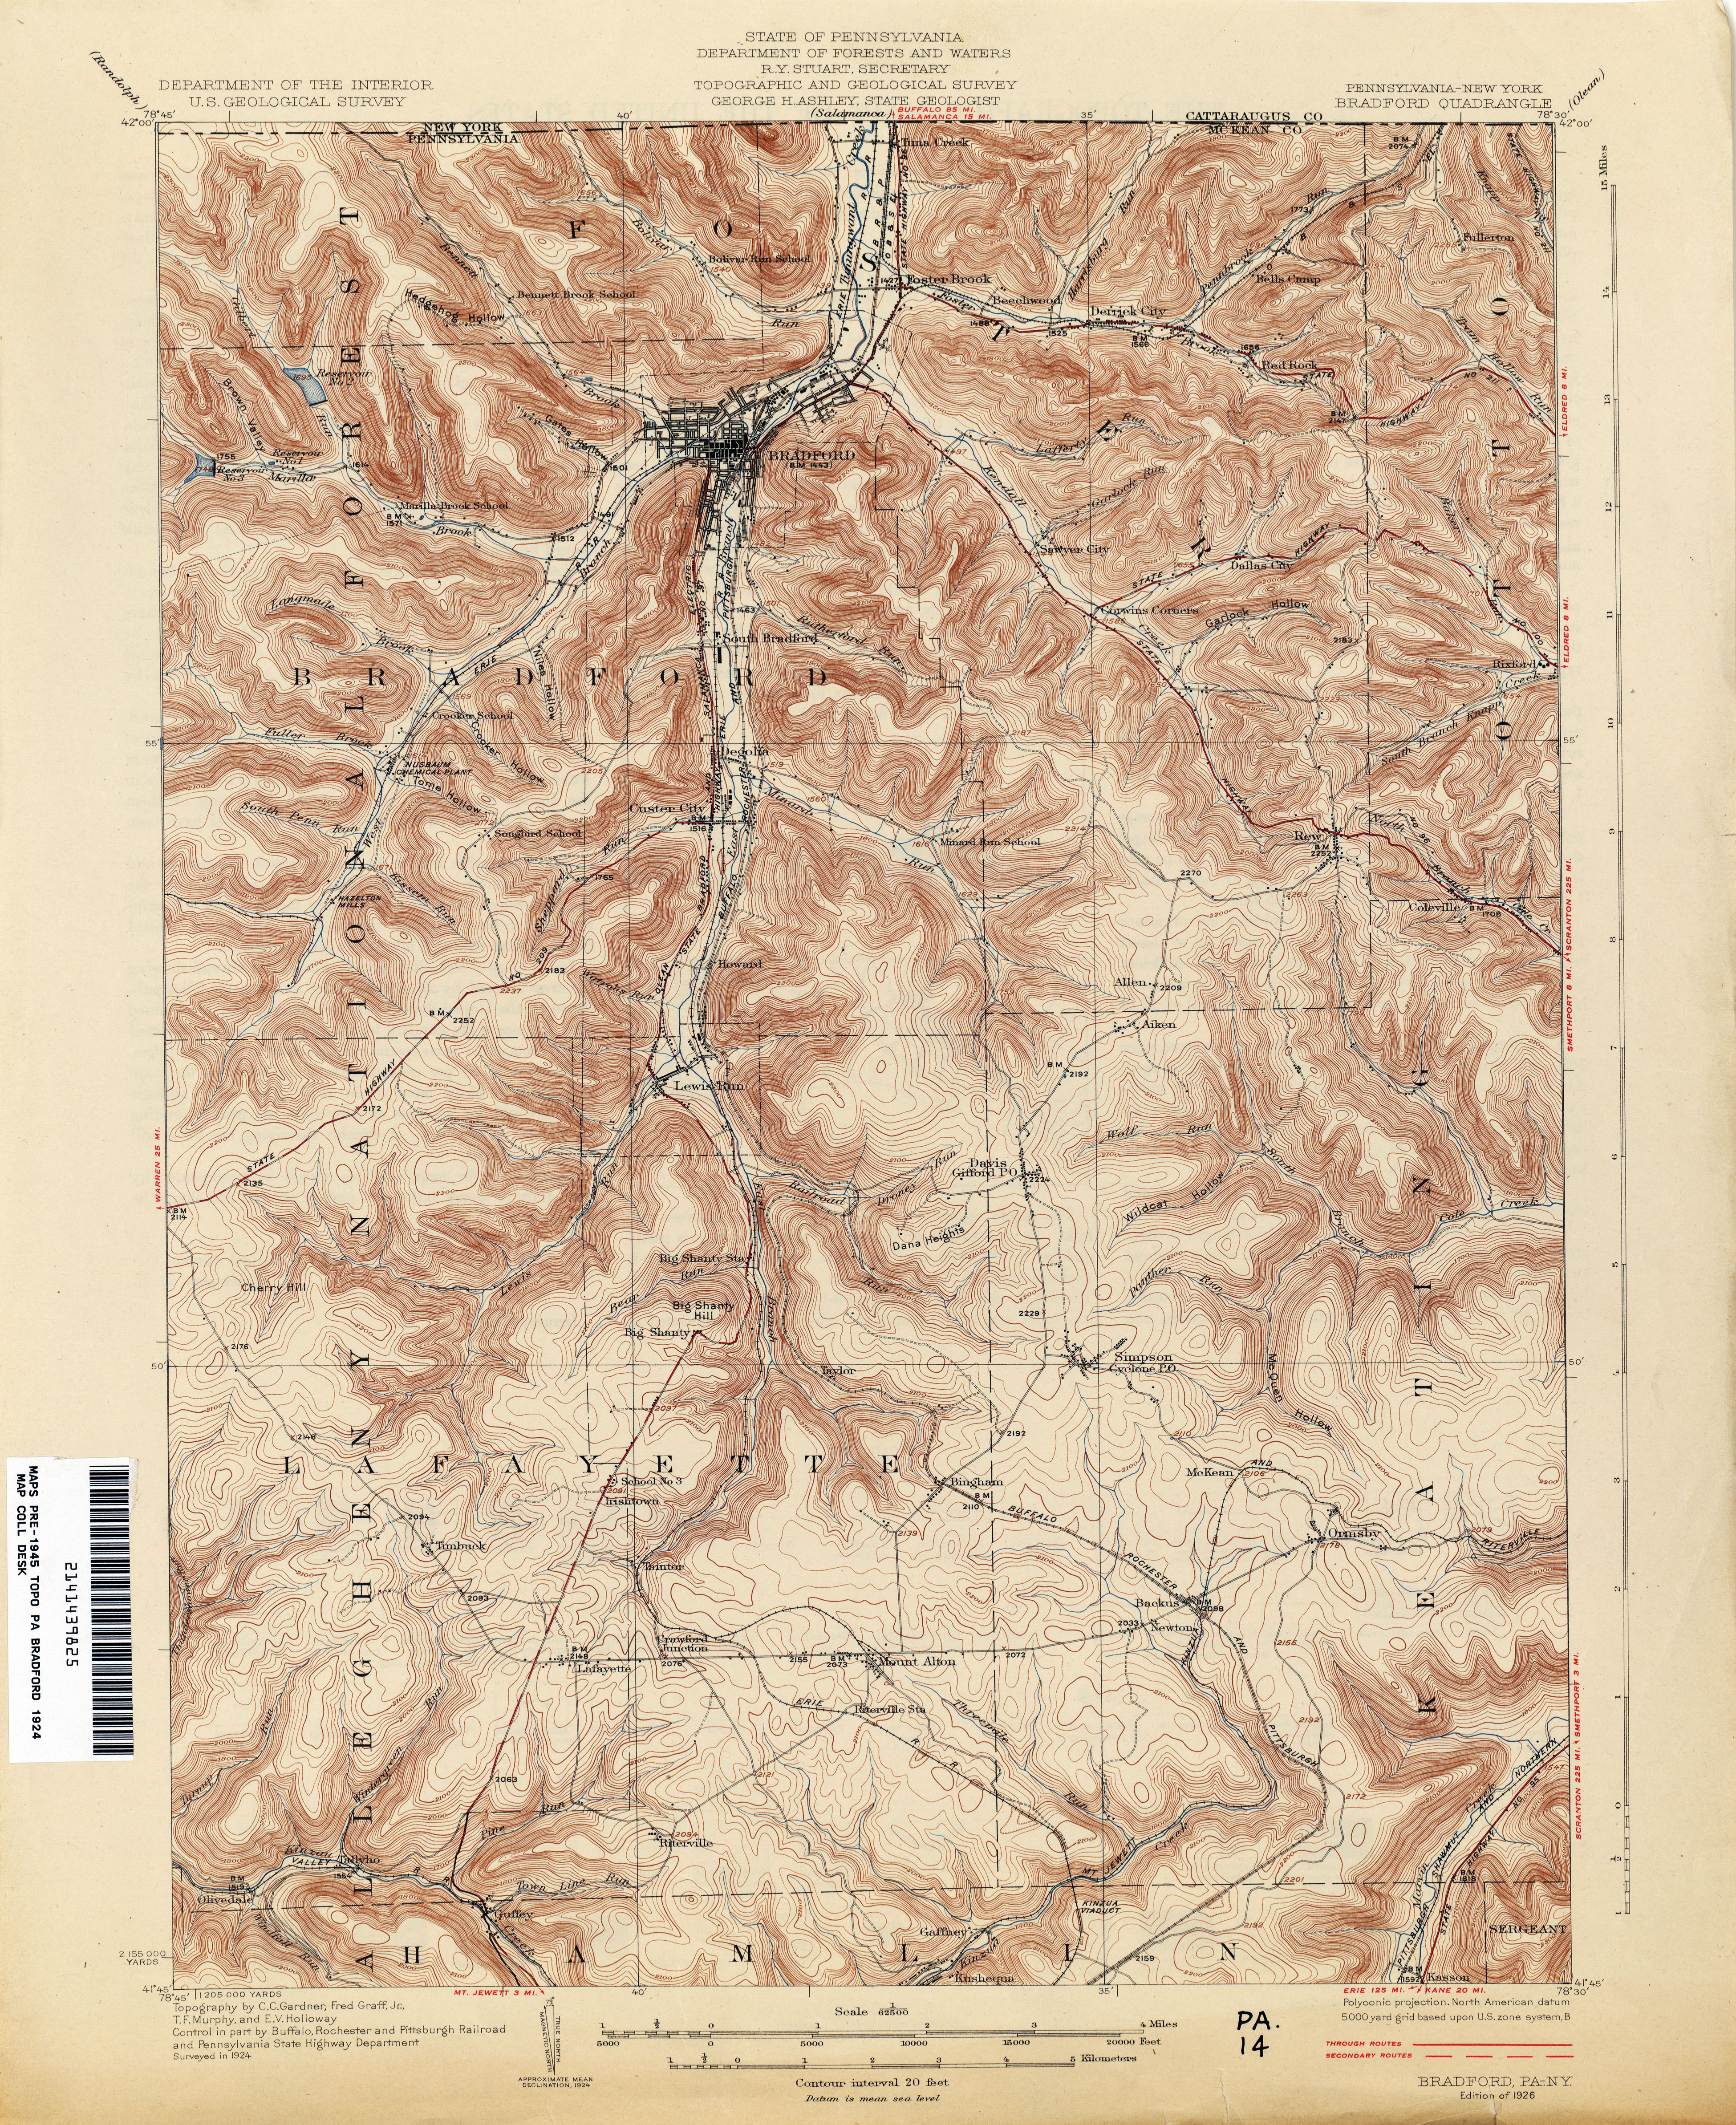 Pennsylvania Historical Topographic Maps Perry Castaneda Map